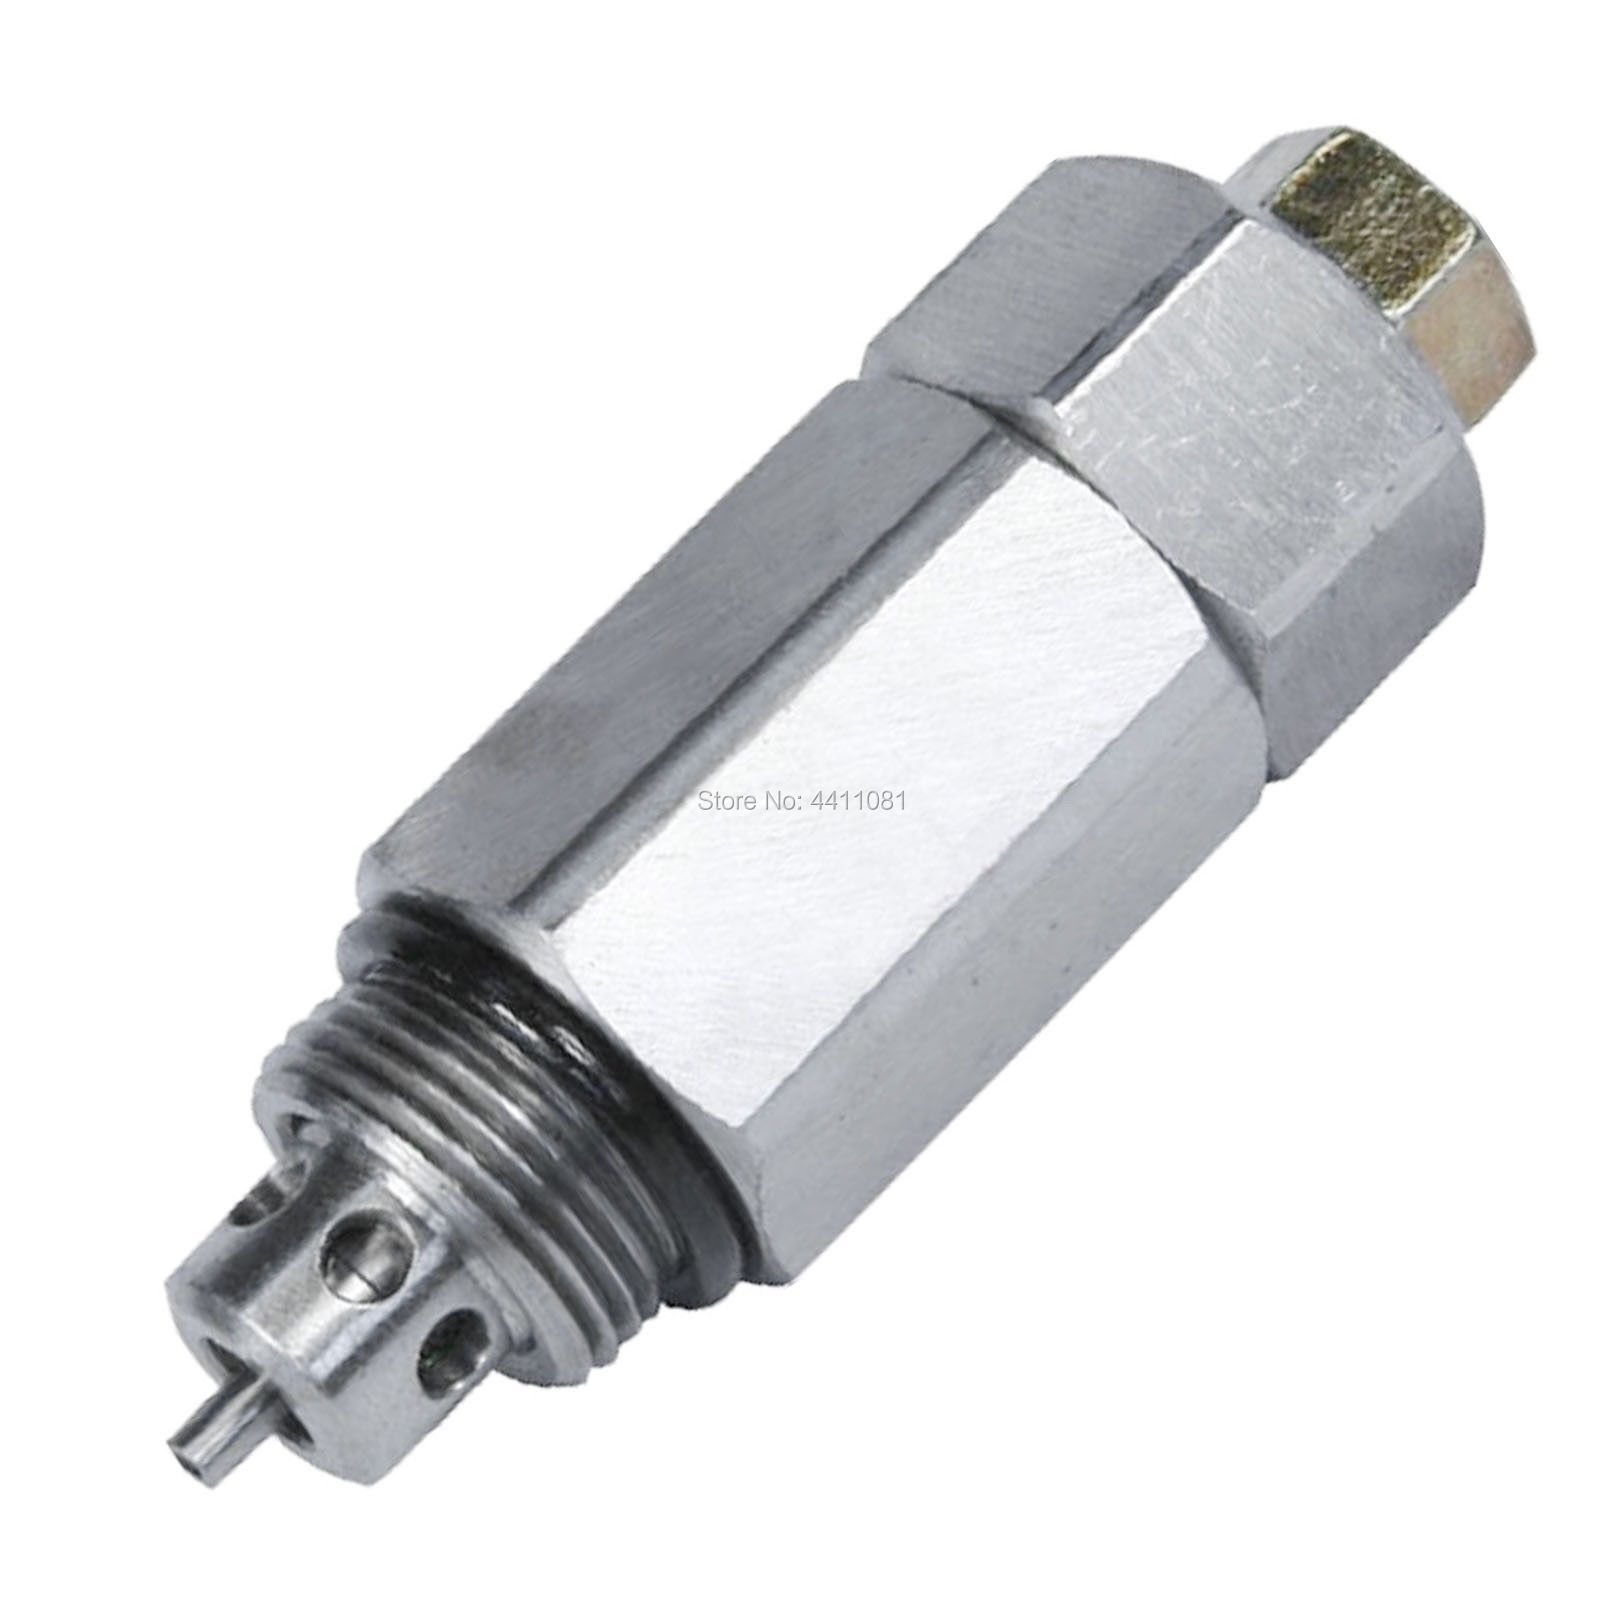 EX200-3 EX200-5 Main Control Valve Assy 4372039 for Hitachi Excavator, 3 month warranty zx210w ex200 4361638 excavator fuel tank cap for hitachi